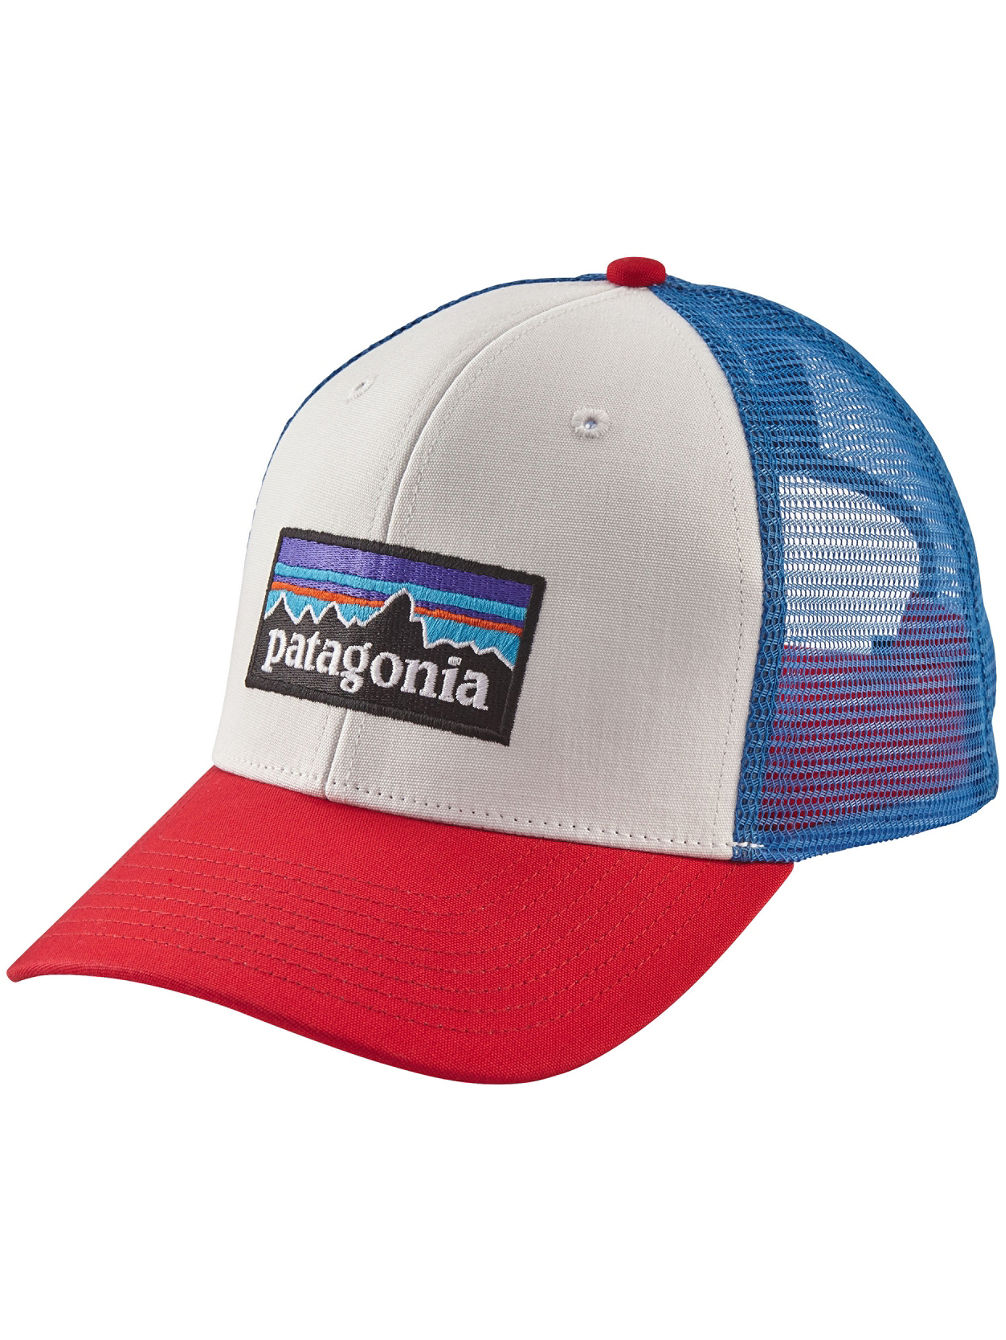 8fc81c5fc64 Buy Patagonia P-6 Logo Trucker Cap online at blue-tomato.com